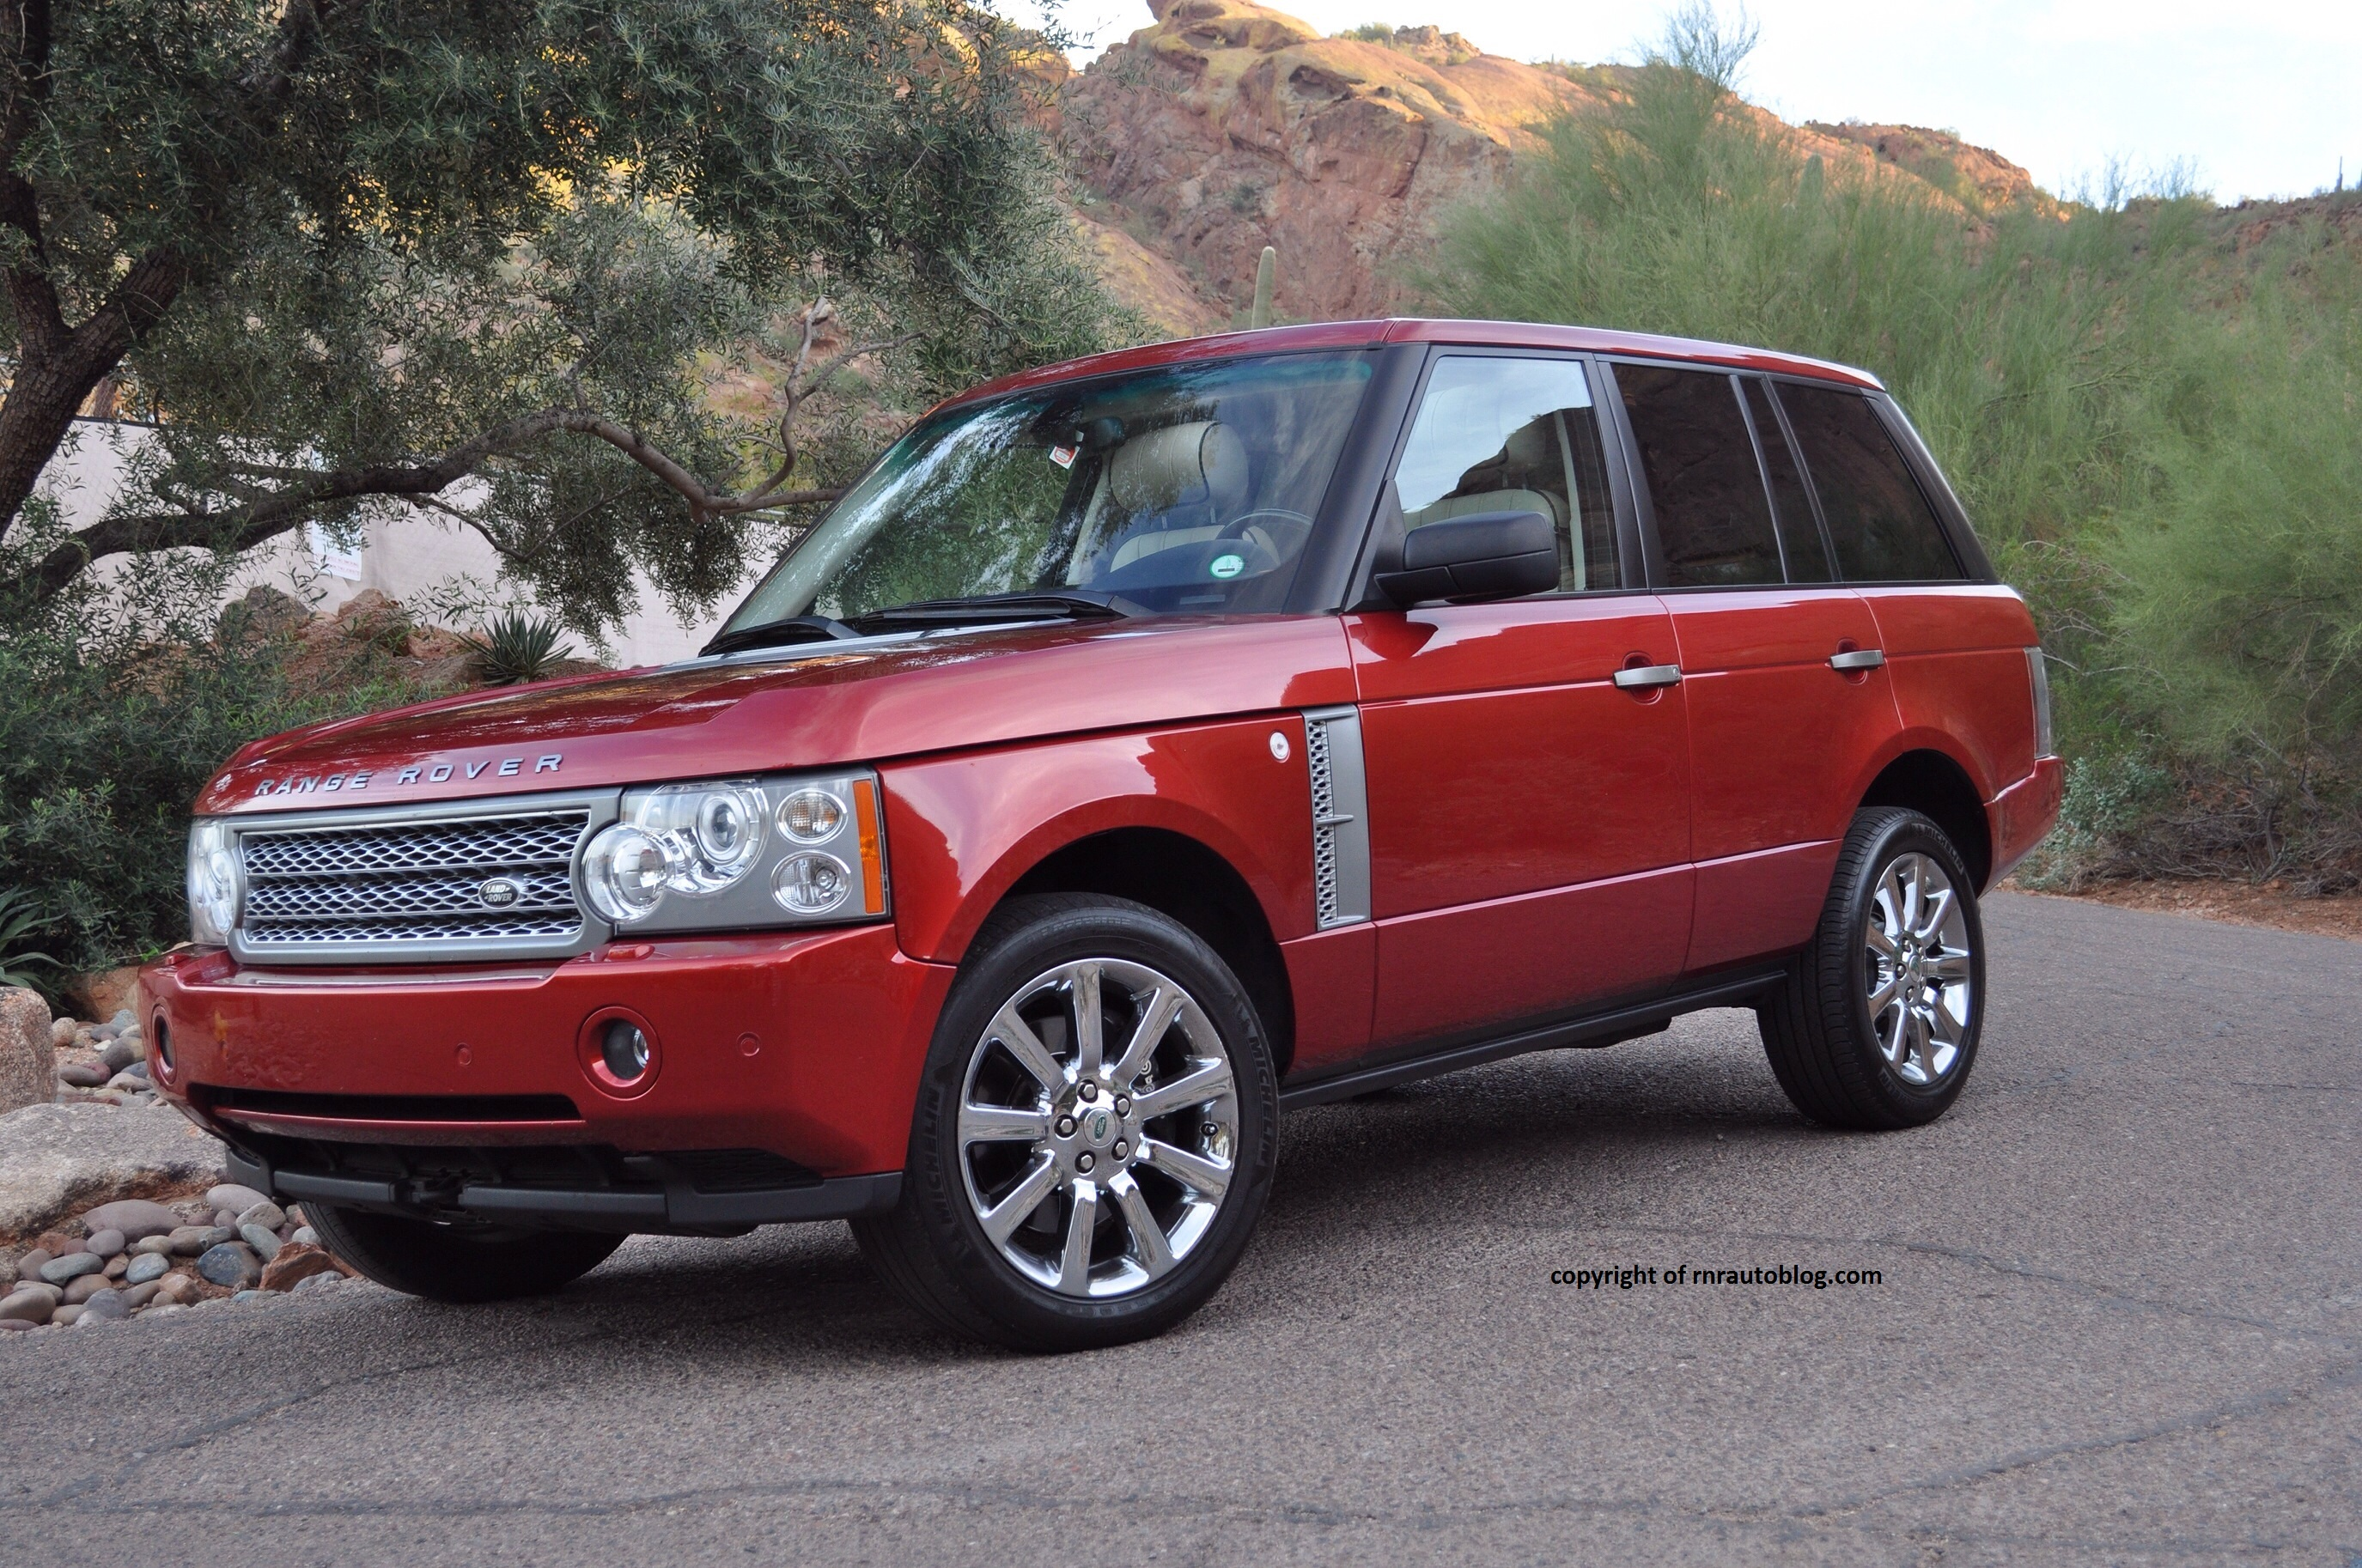 2006 land rover range rover supercharged review rnr automotive blog. Black Bedroom Furniture Sets. Home Design Ideas